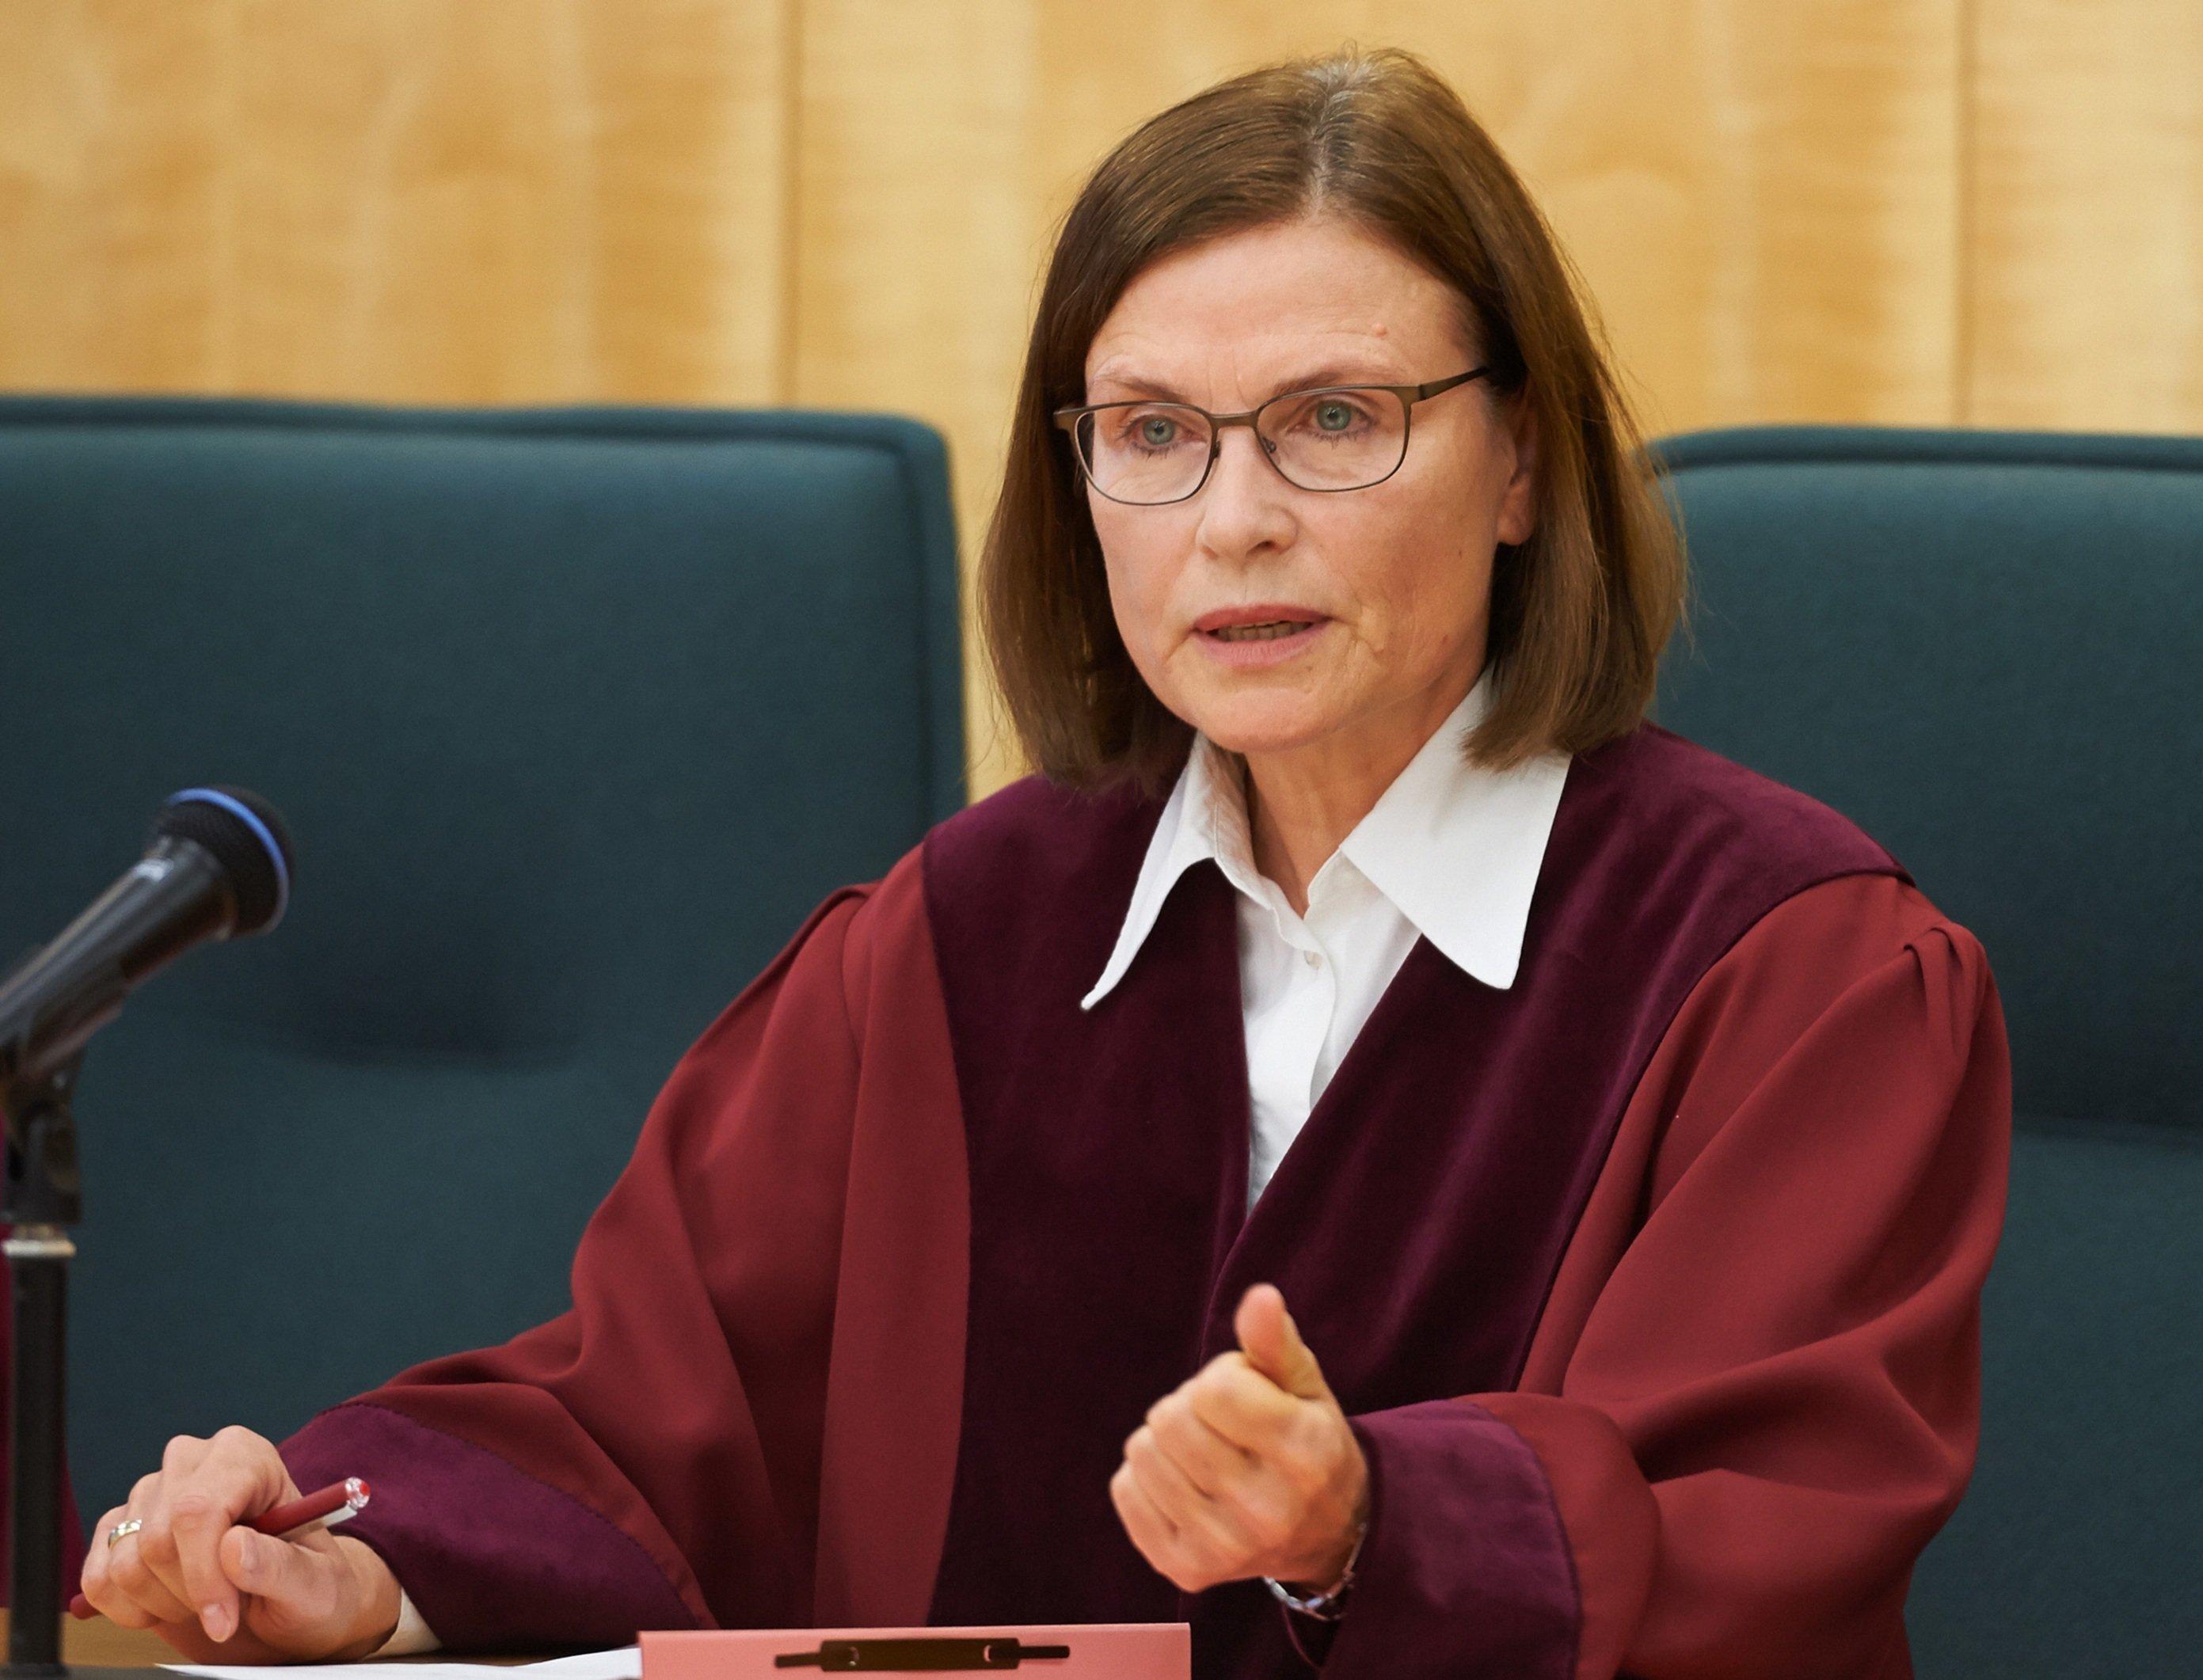 Top-News To Go: Gericht entscheidet – mutmaßlicher Bin-Laden-Leibwächter muss nach Deutschland zurückgeholt